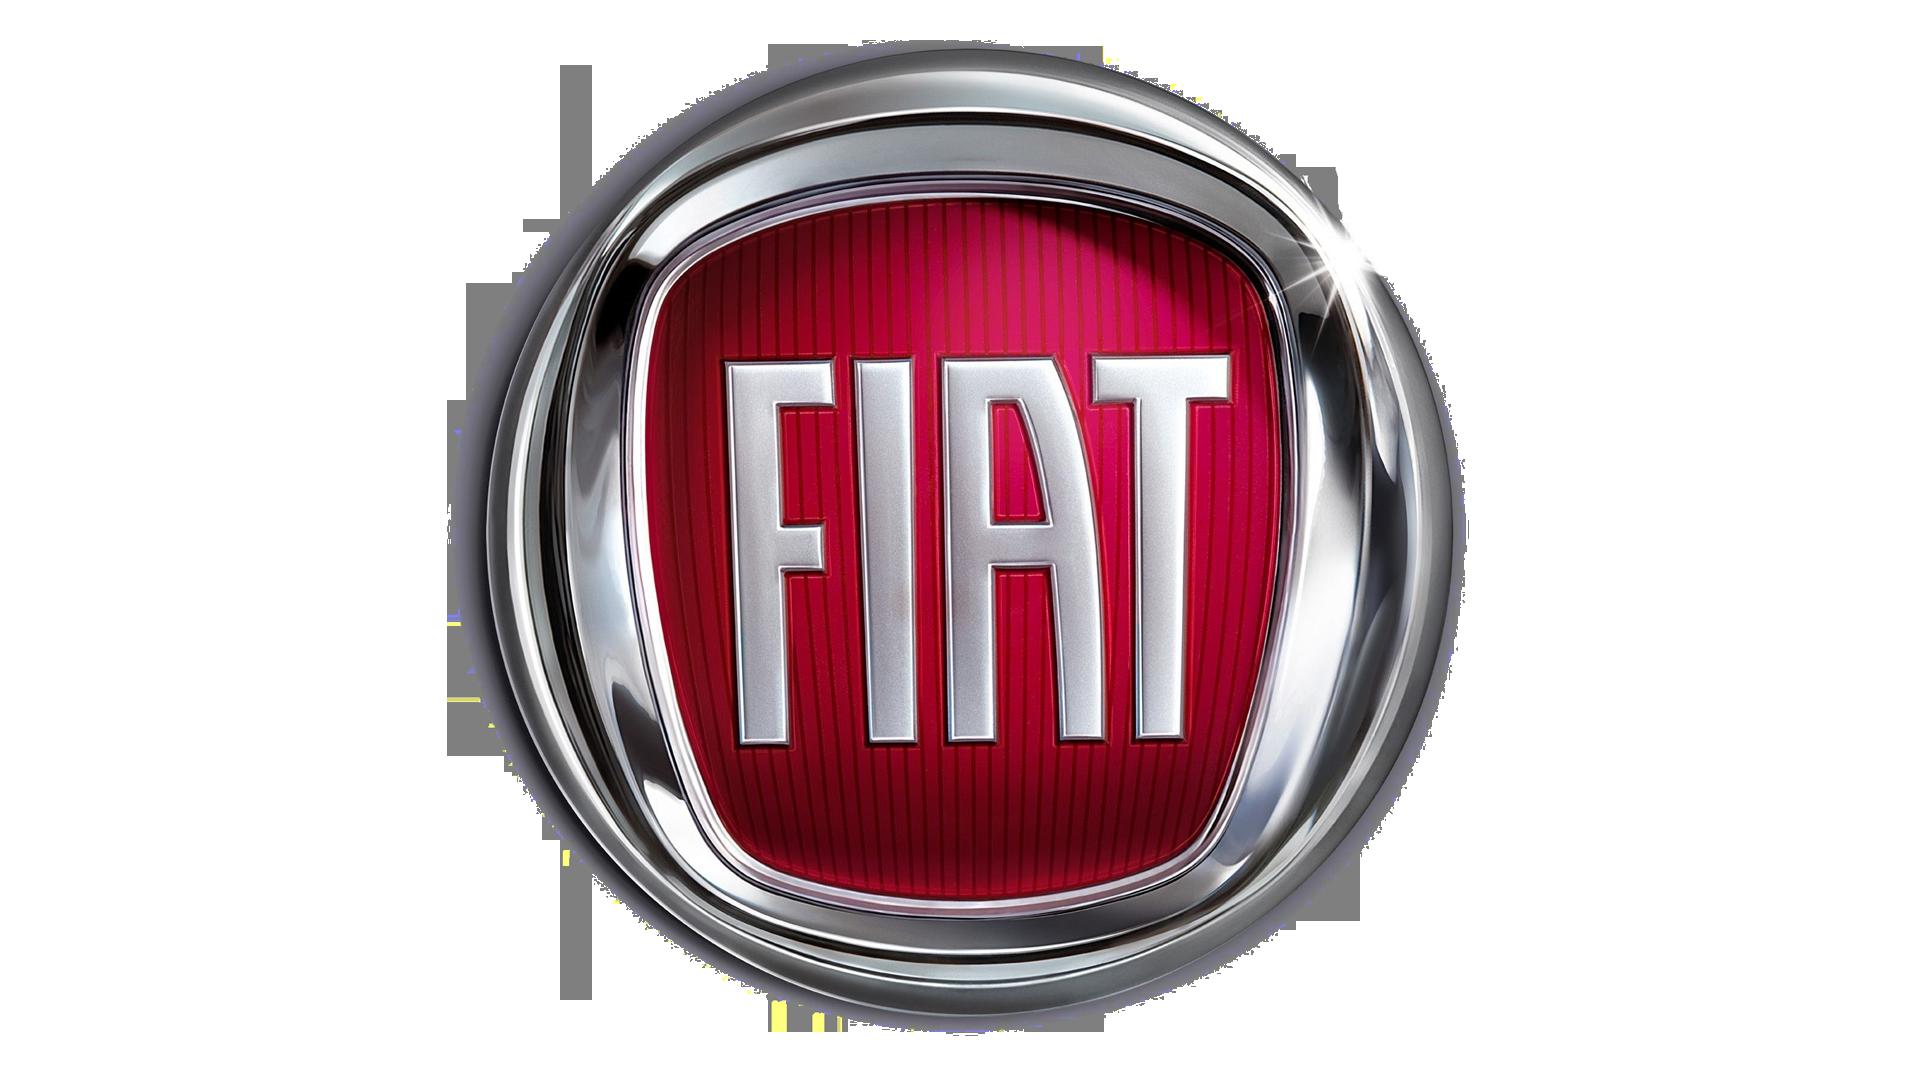 Fiat of Strongsville - Italian Car Manufacturer